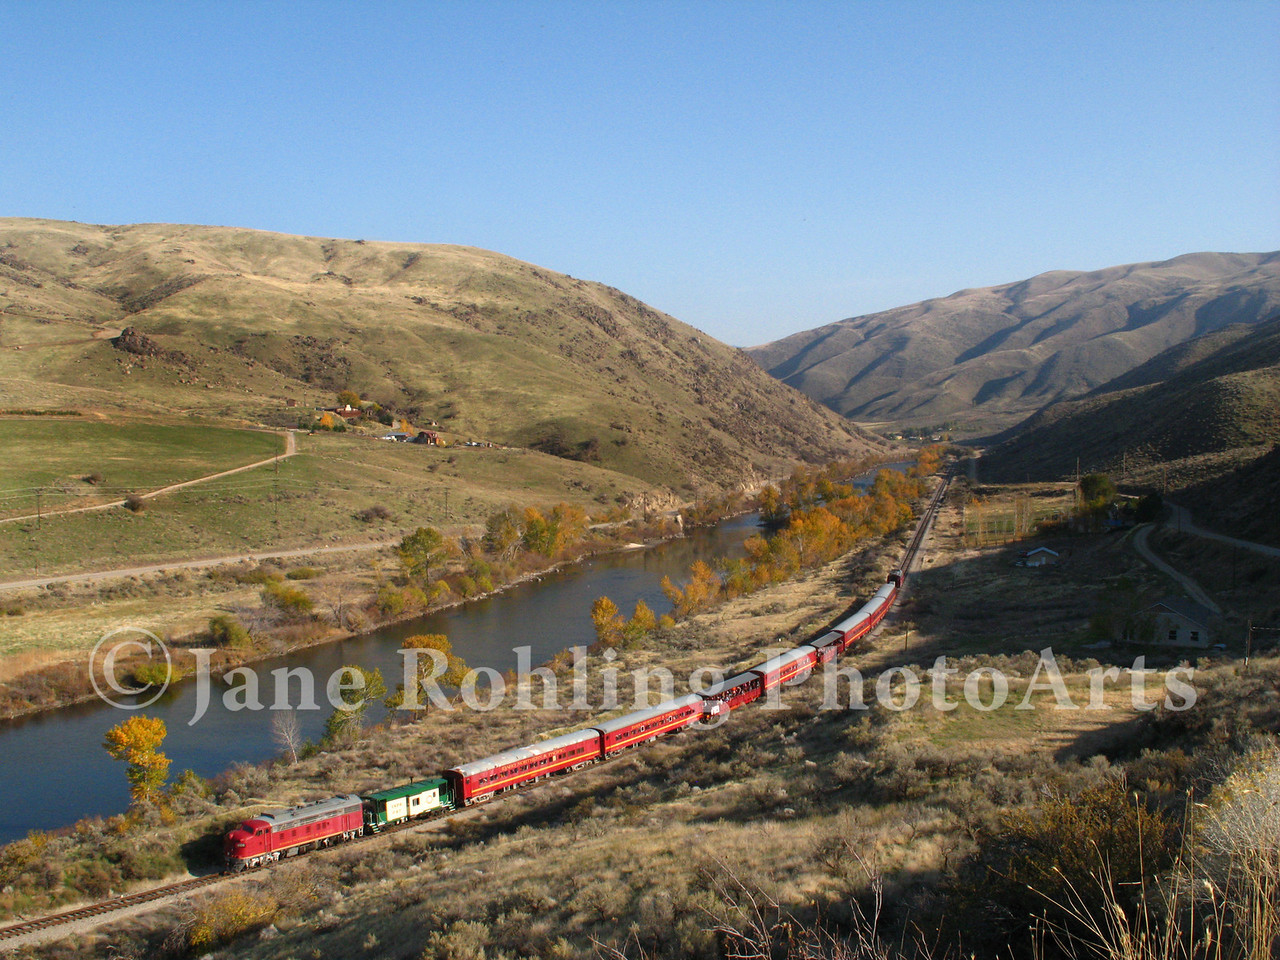 The Thunder Mountain Railroad along the Payette River near Horseshoe Bend, Idaho.